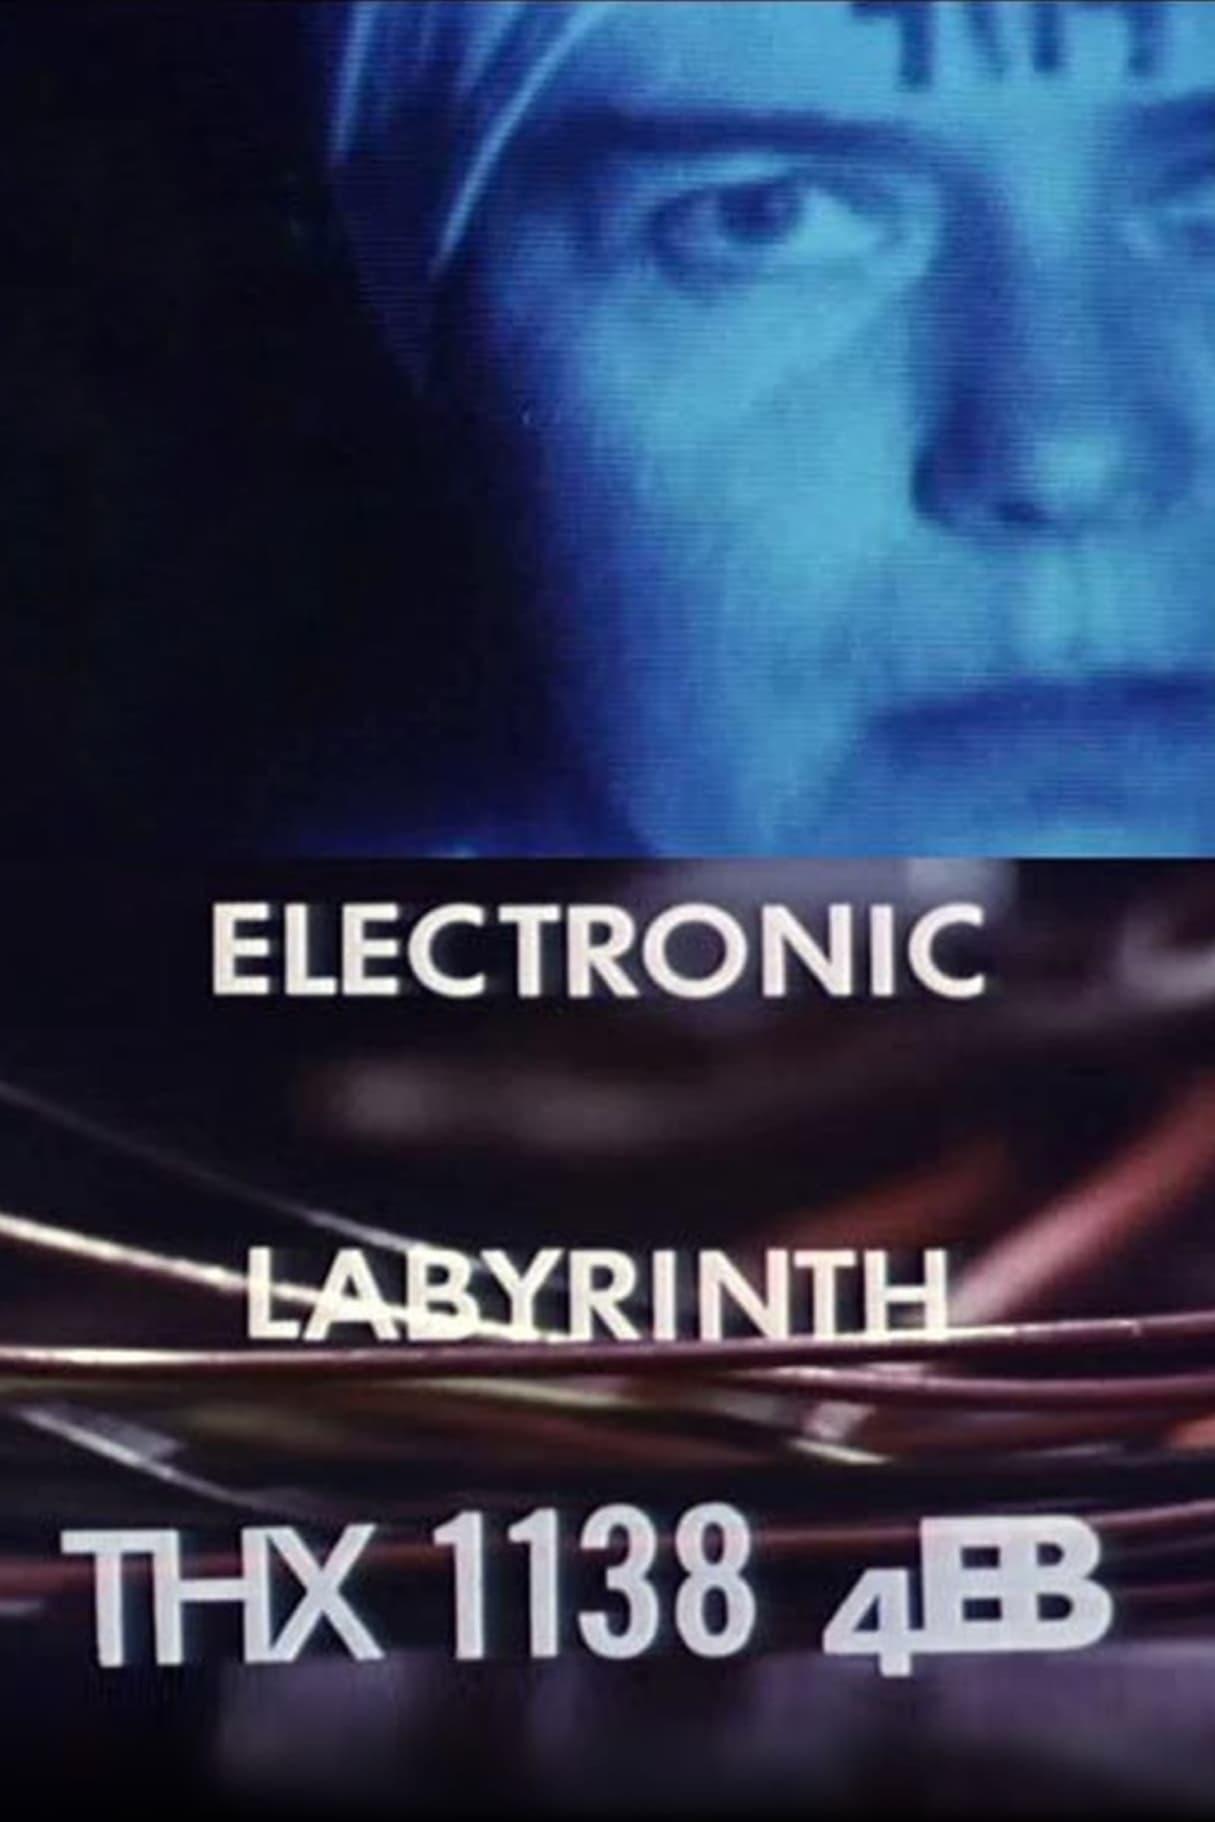 Electronic Labyrinth: THX 1138 4EB